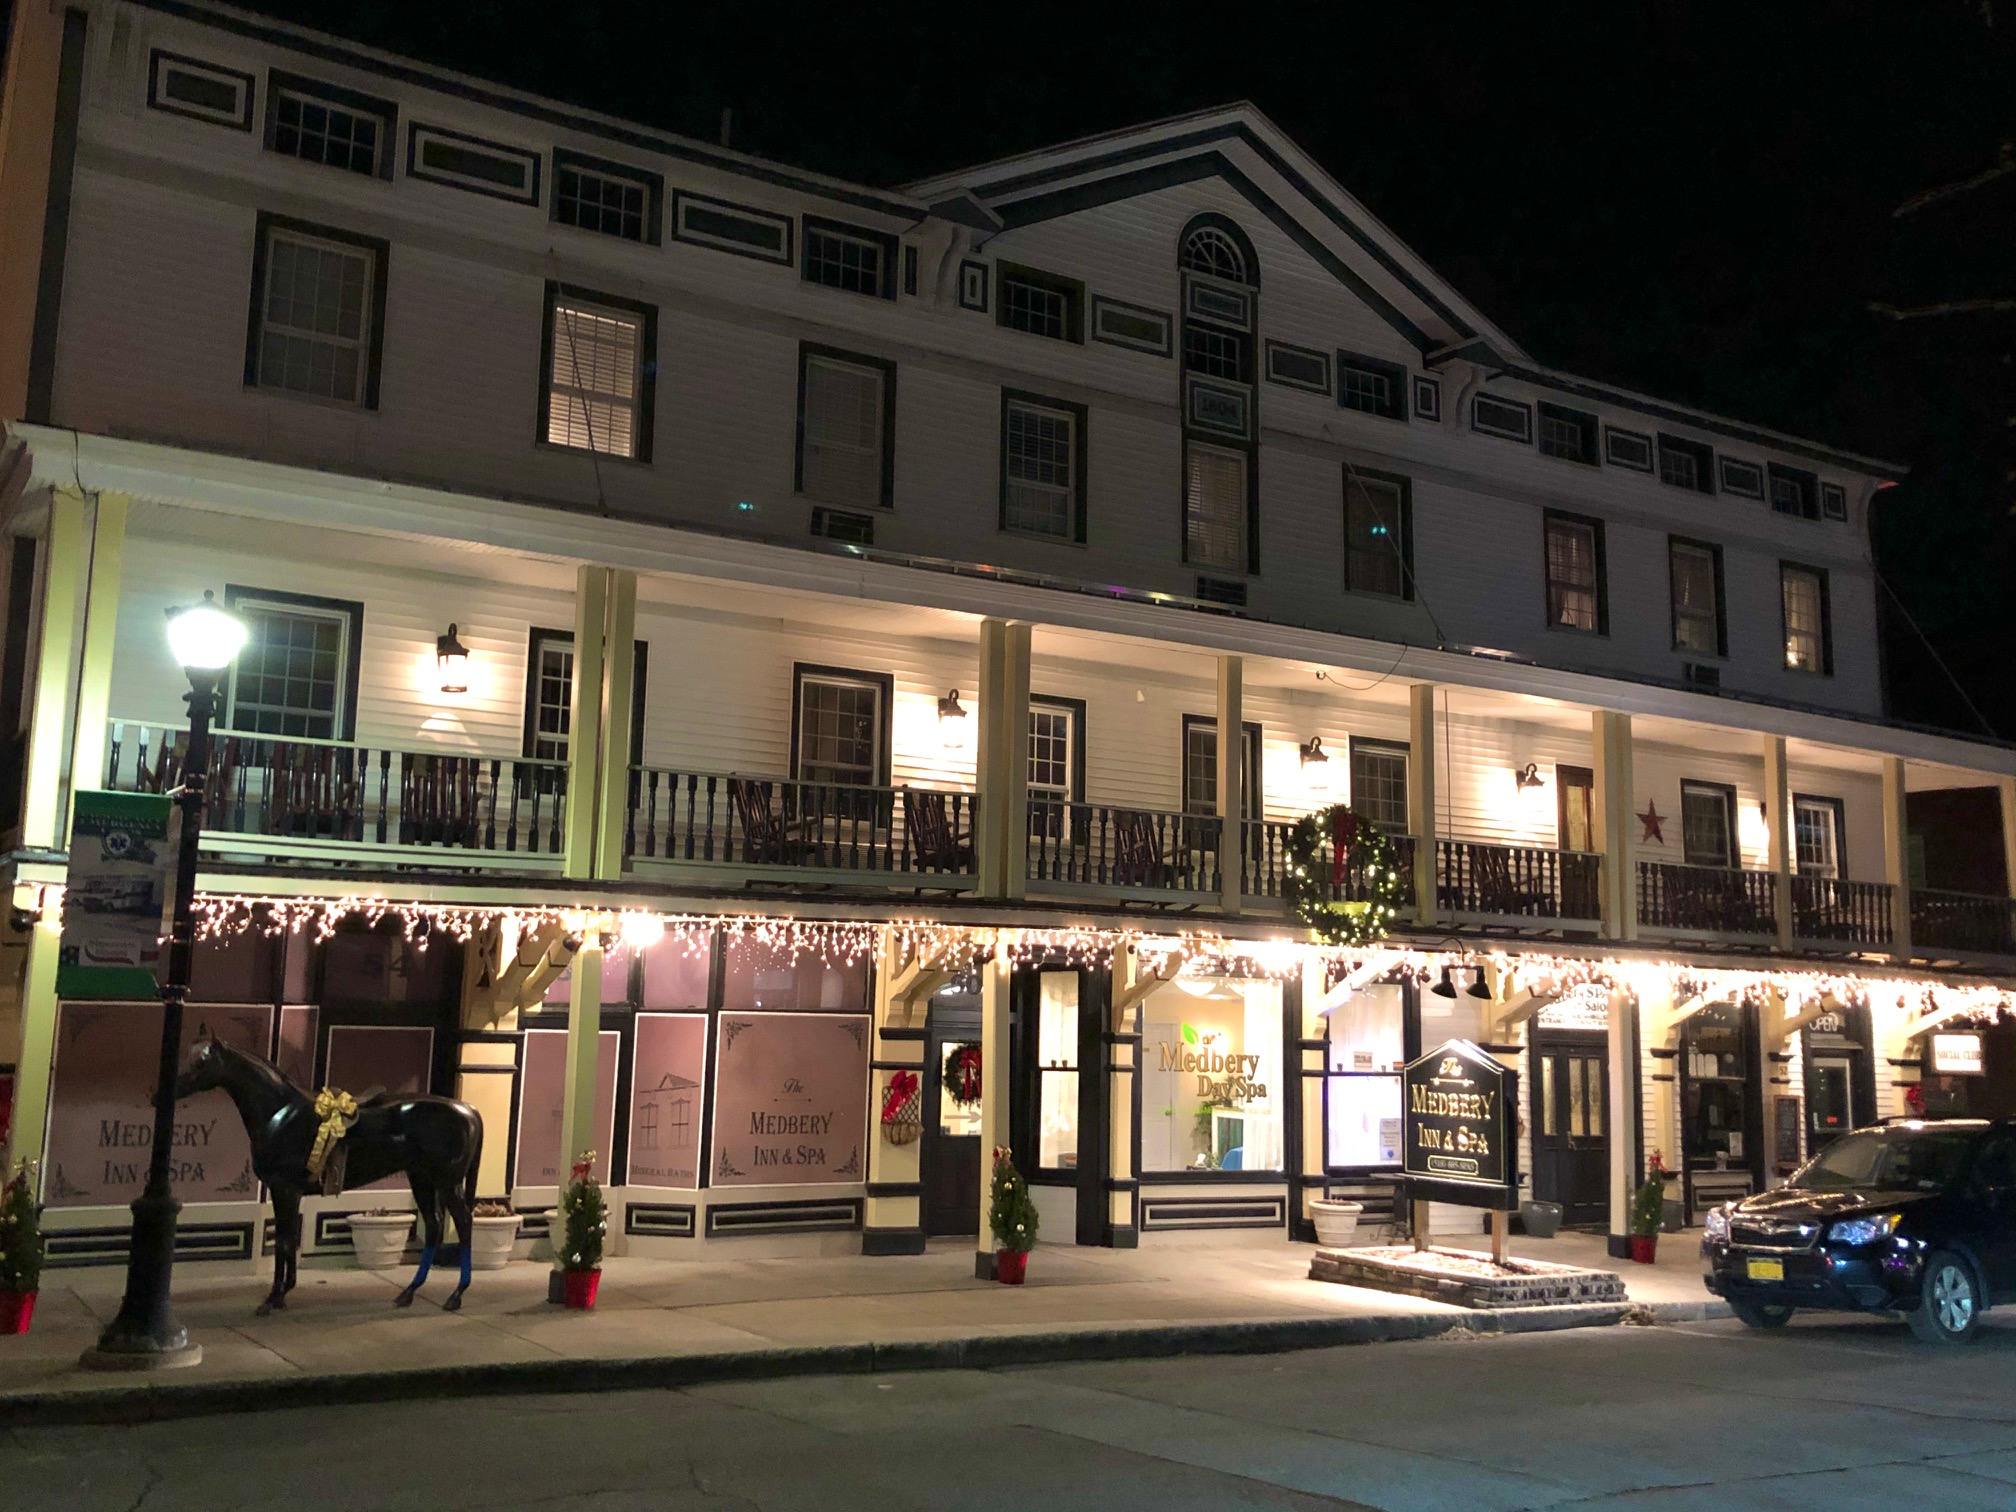 Medbery Inn & Spa